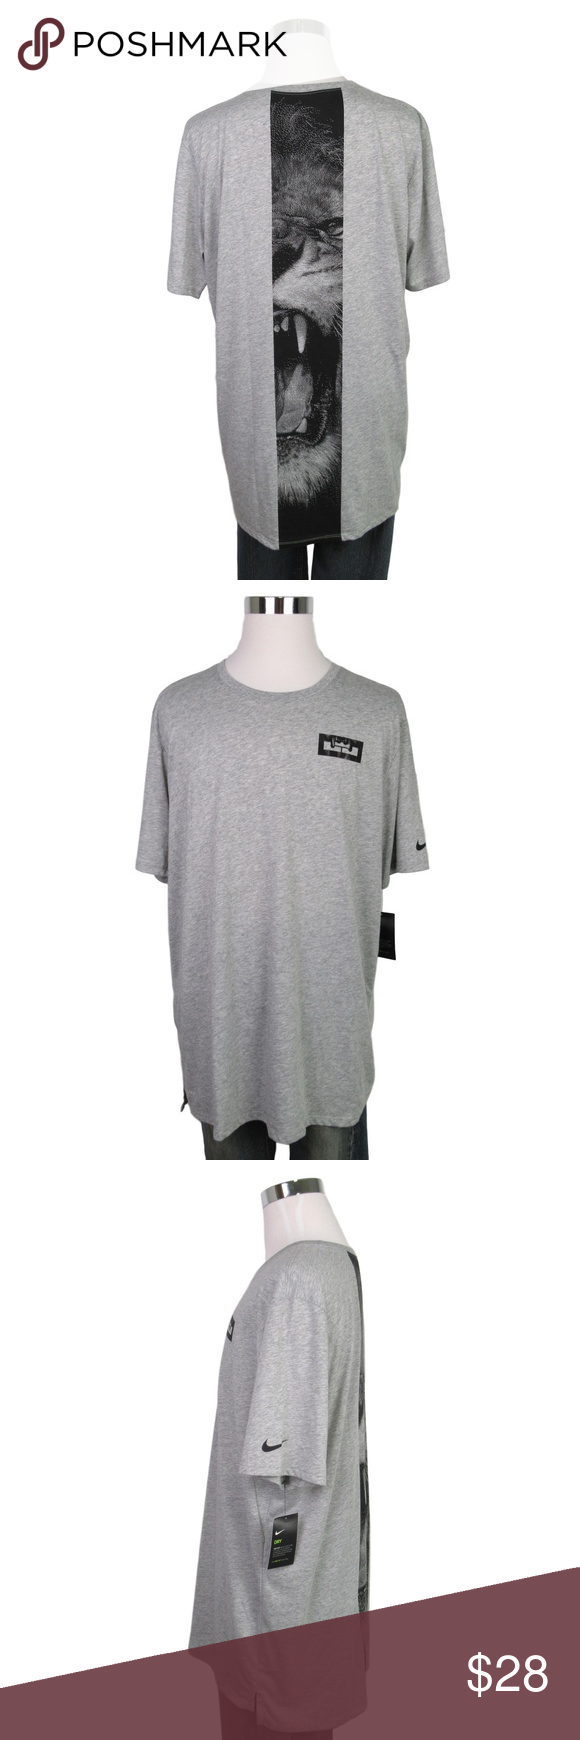 Nike Lebron James Graphic Lion Grey Xl T Shirt Nike Lebron James Graphic Lion Grey T Shirt Style 831091 063 Men S Si Tshirt Style Nike Shirts Gray Tshirt [ 1740 x 580 Pixel ]